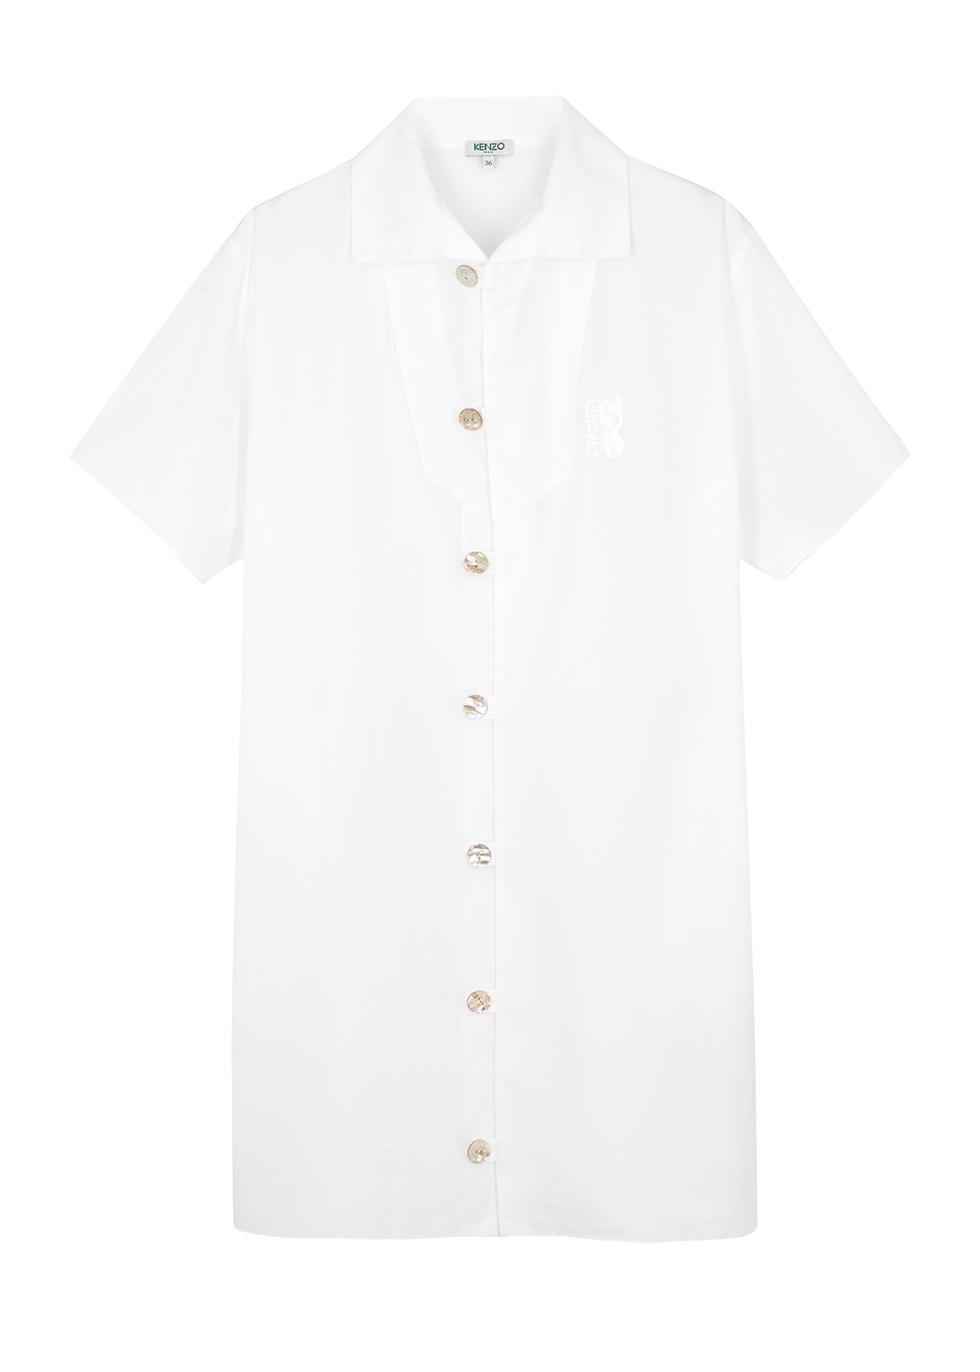 White poplin shirt dress